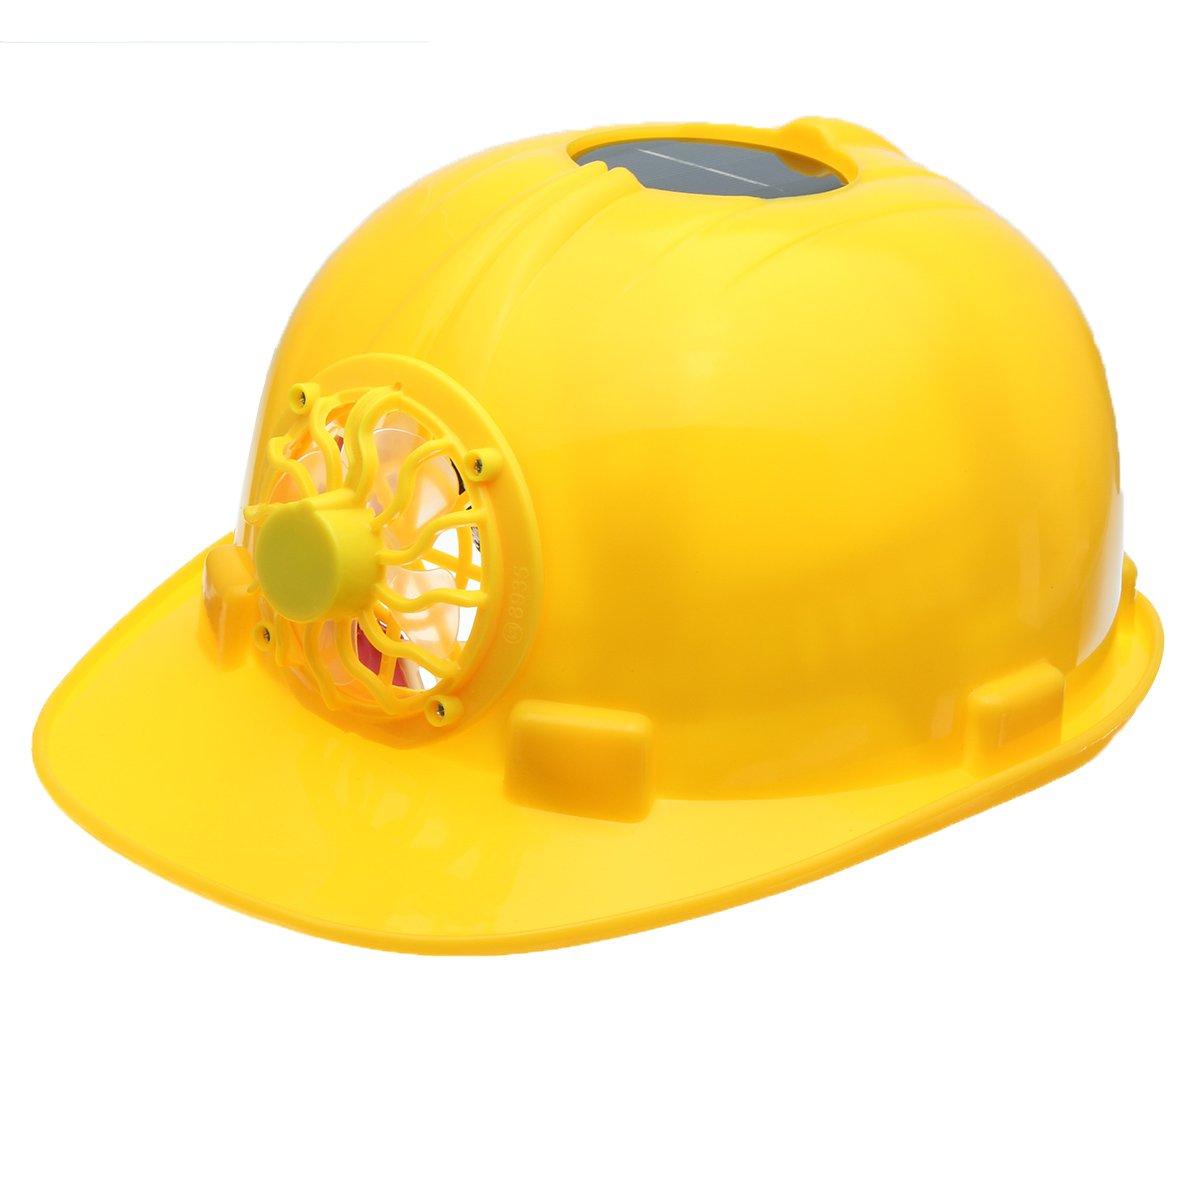 OlogyMart Yellow Solar Power Safety Helmet Work Hard Hat Solar Panel Cooling Fan